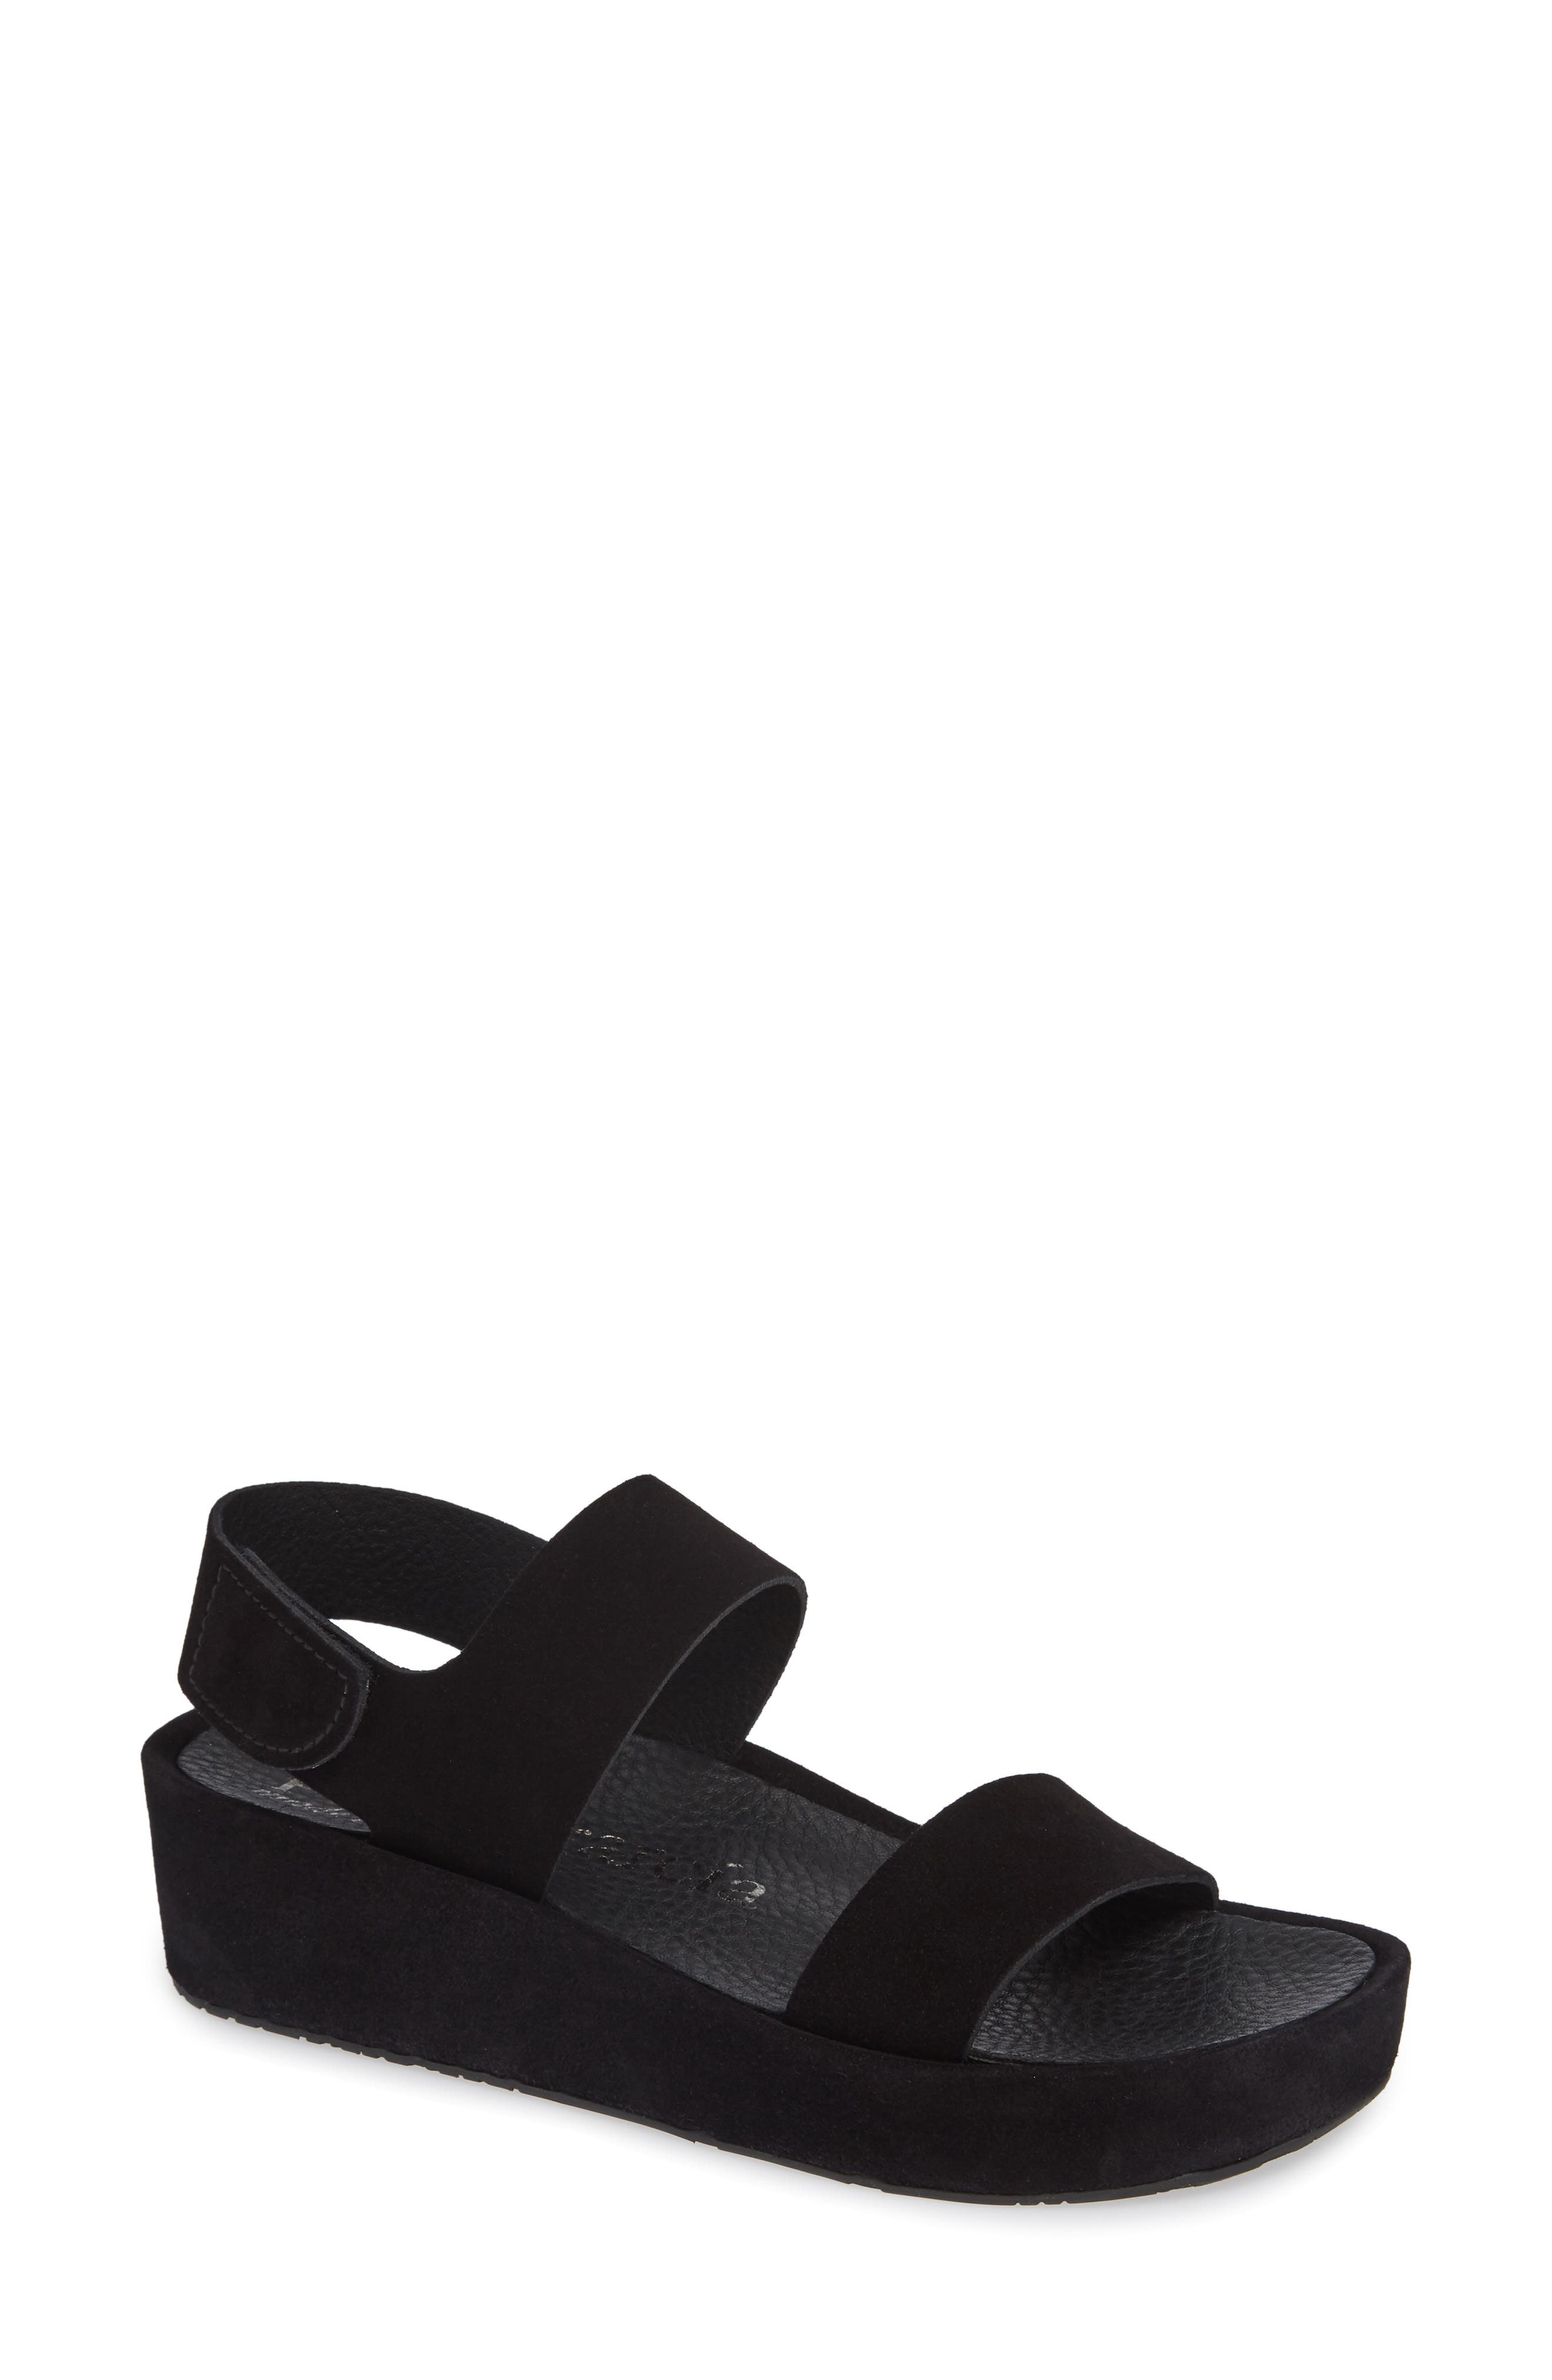 Lacey Footbed Sandal,                         Main,                         color, BLACK CASTORO